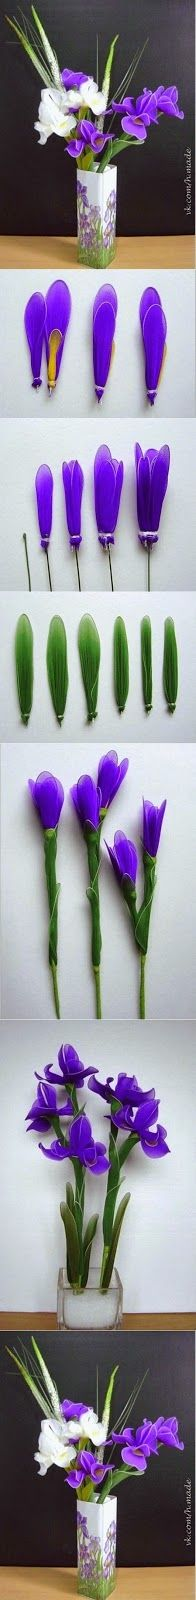 Be Amaze with these DIY IDEAS: Nylon Flower